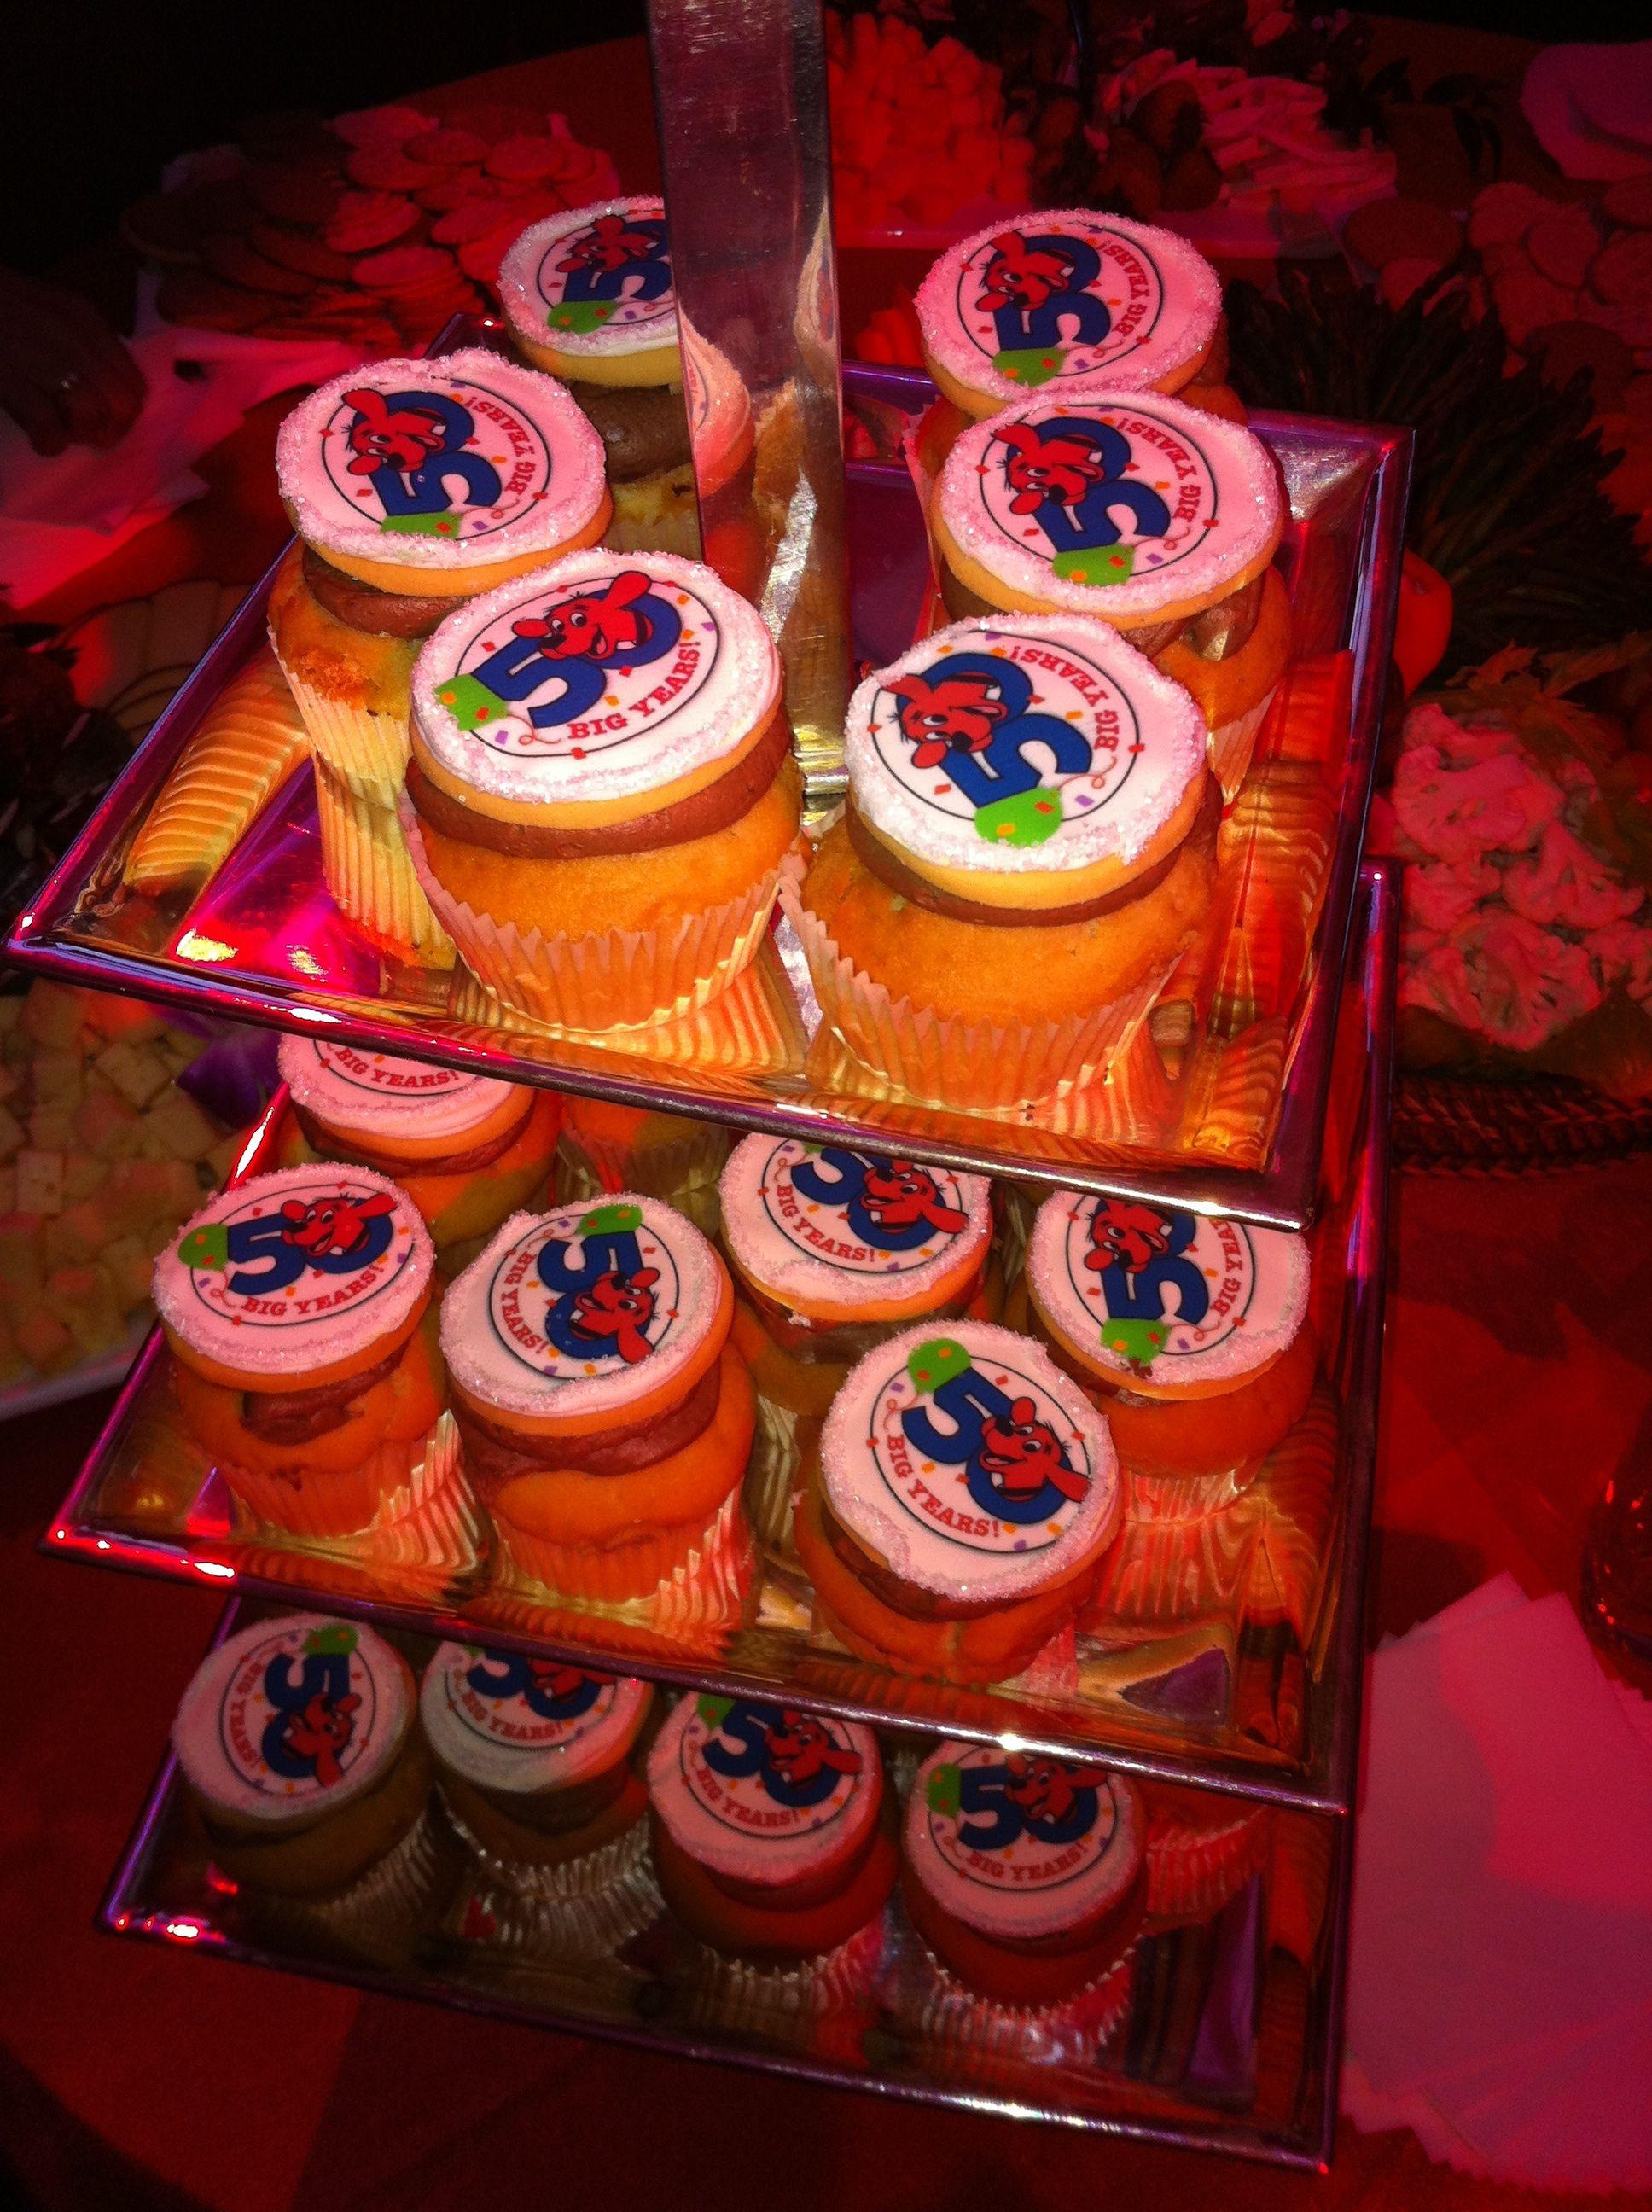 Clifford Cupcakes